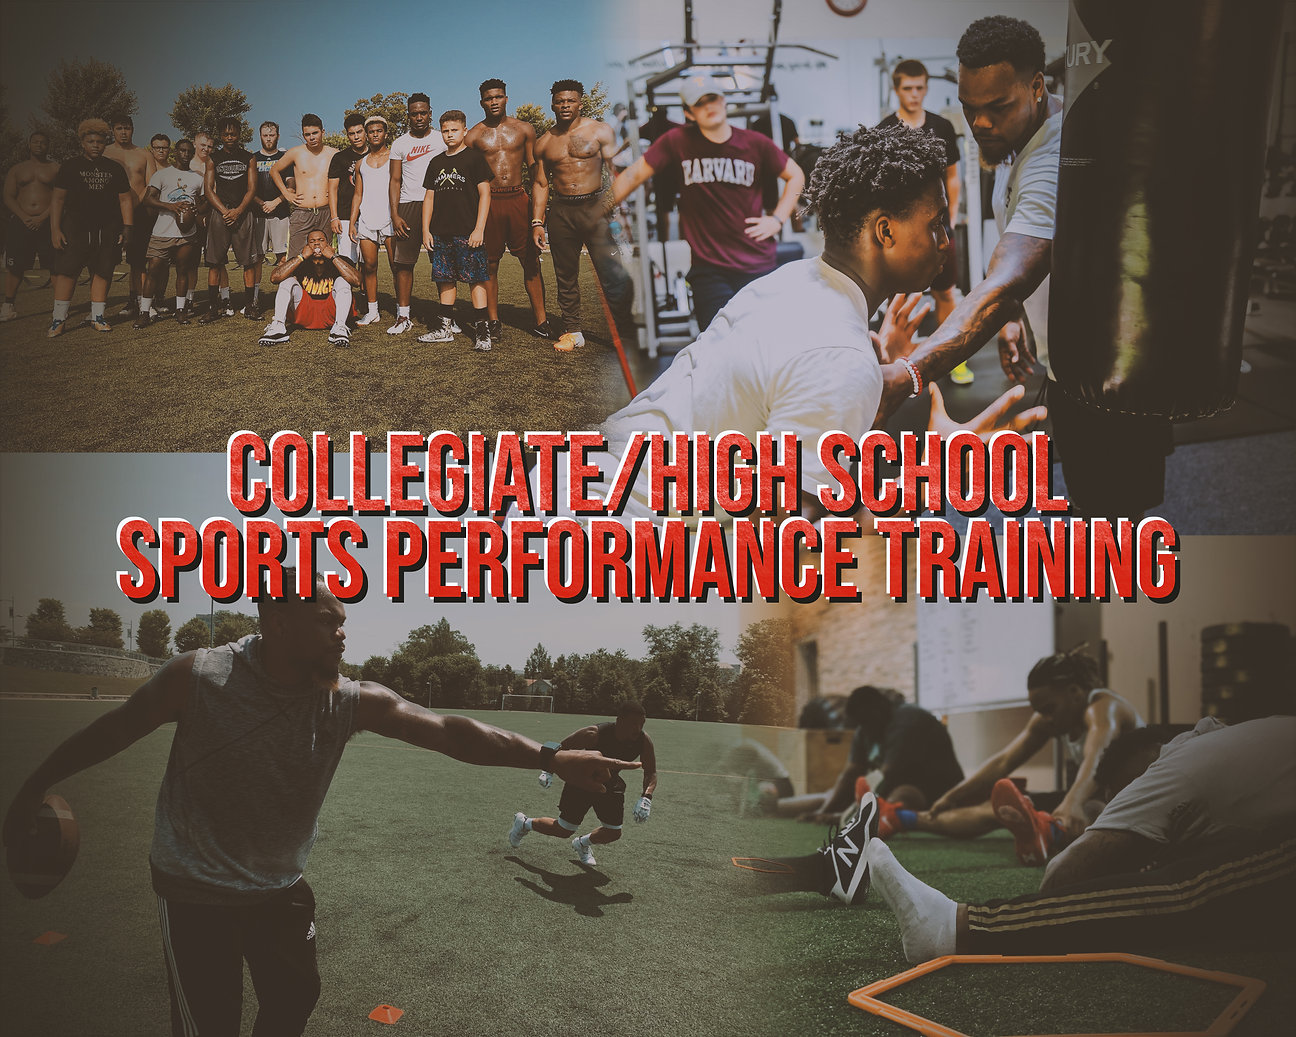 Collegiate-High School Sports Performanc